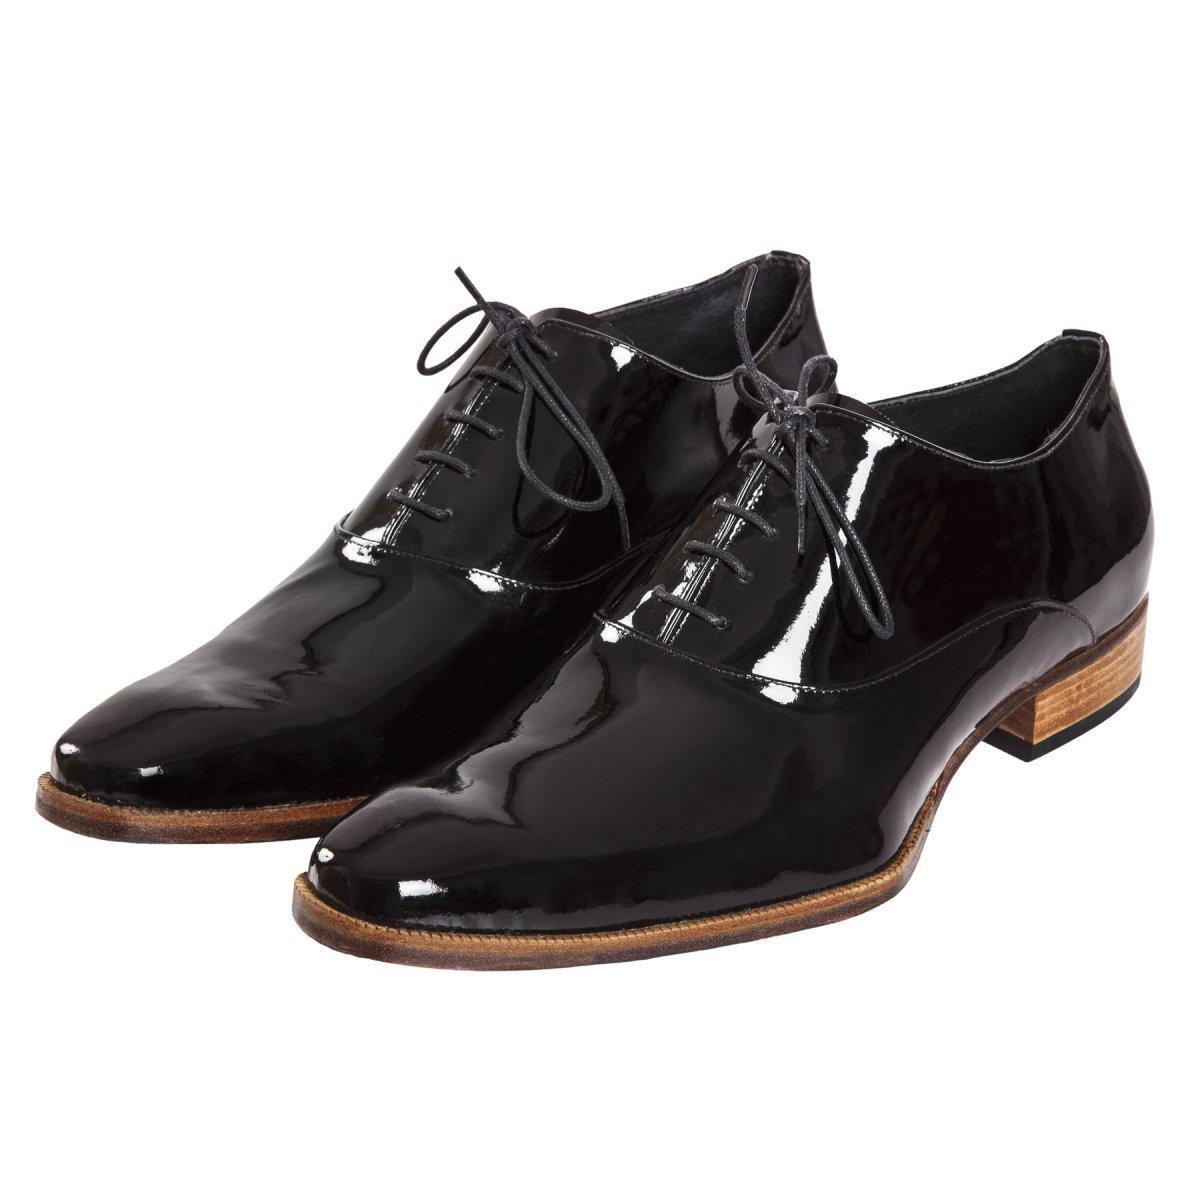 Sapato Feminino Oxford Verniz Preto